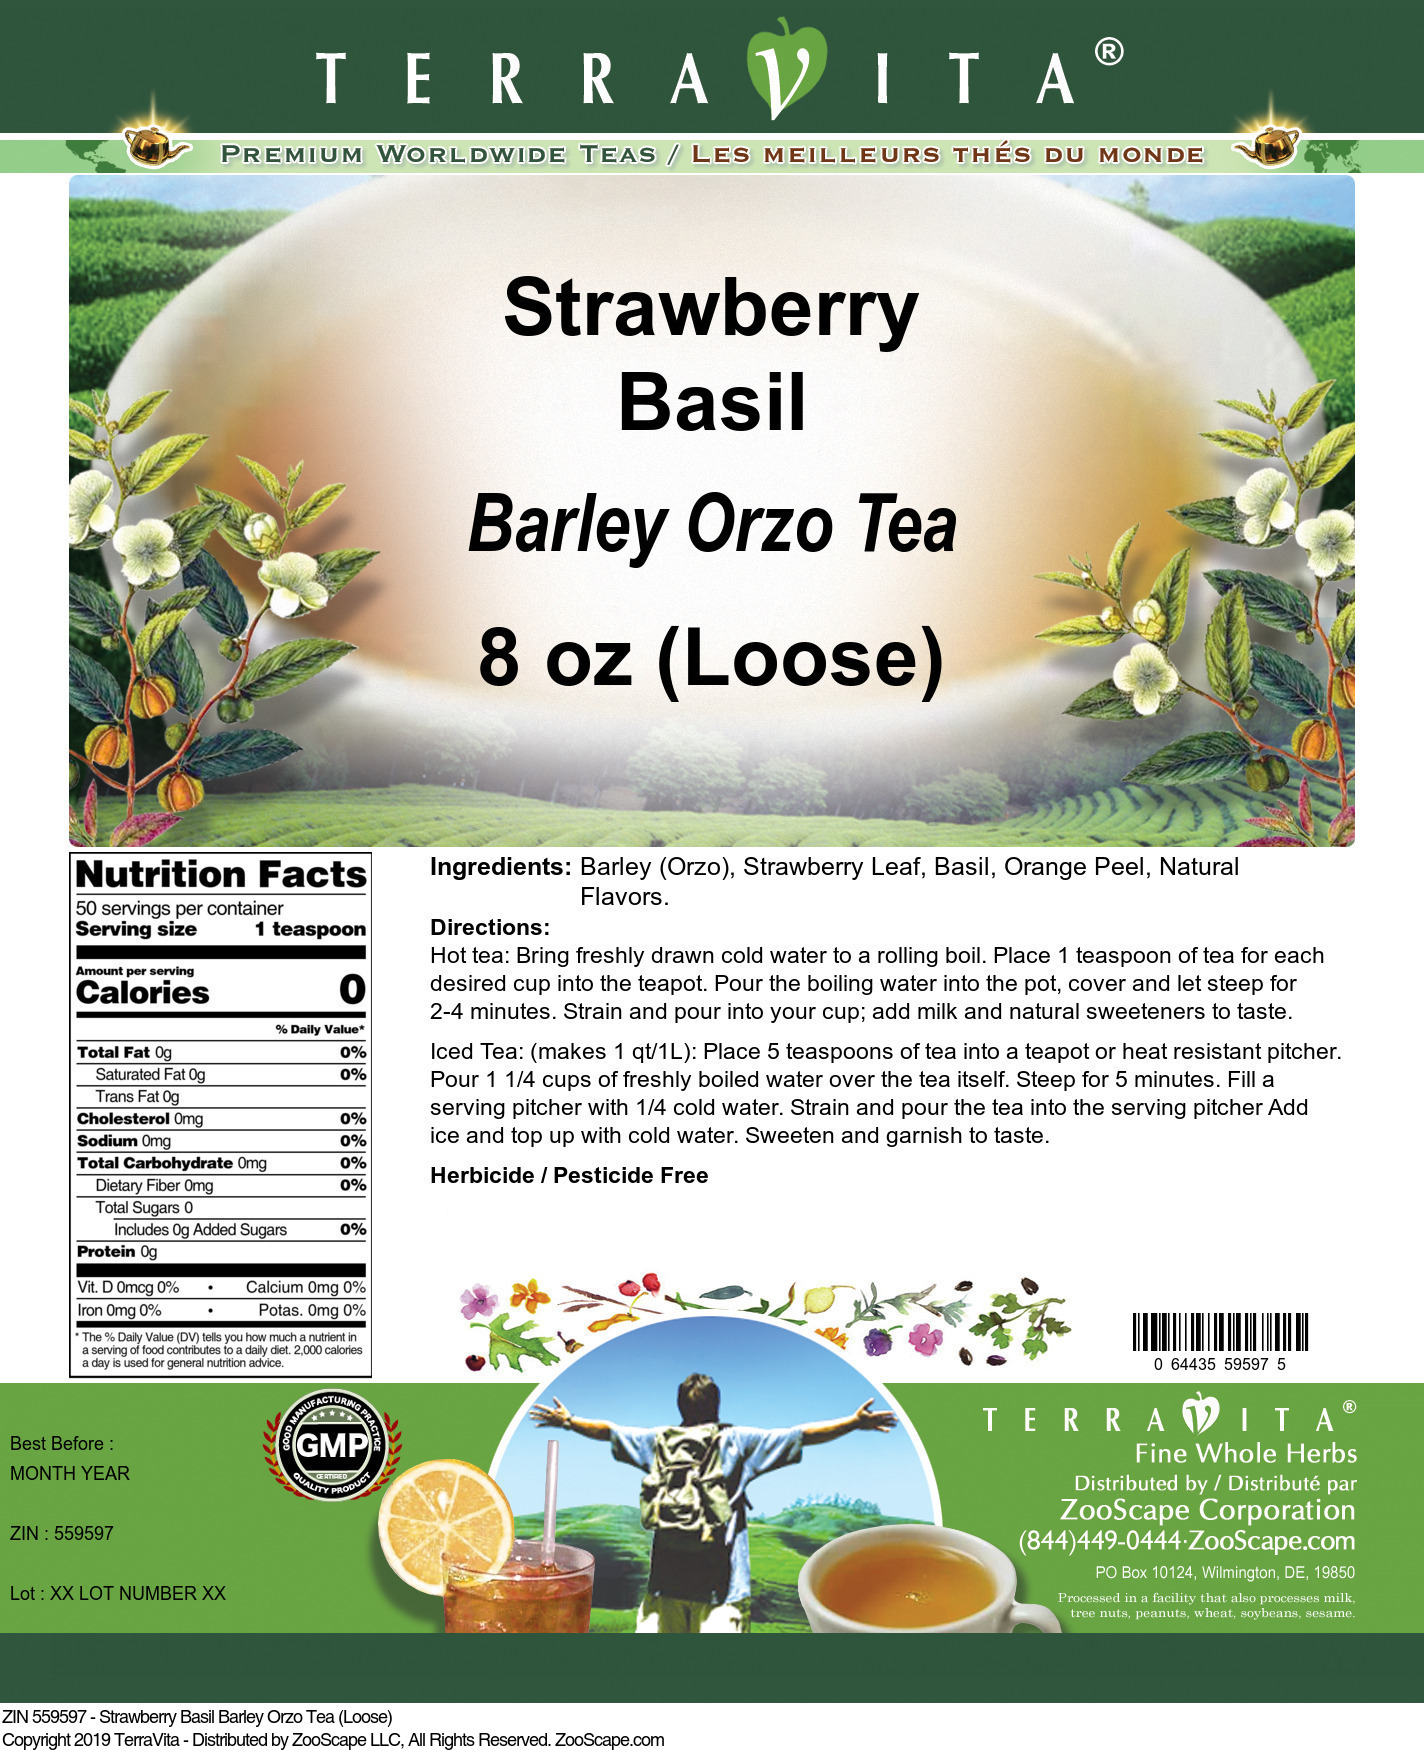 Strawberry Basil Barley Orzo Tea (Loose)